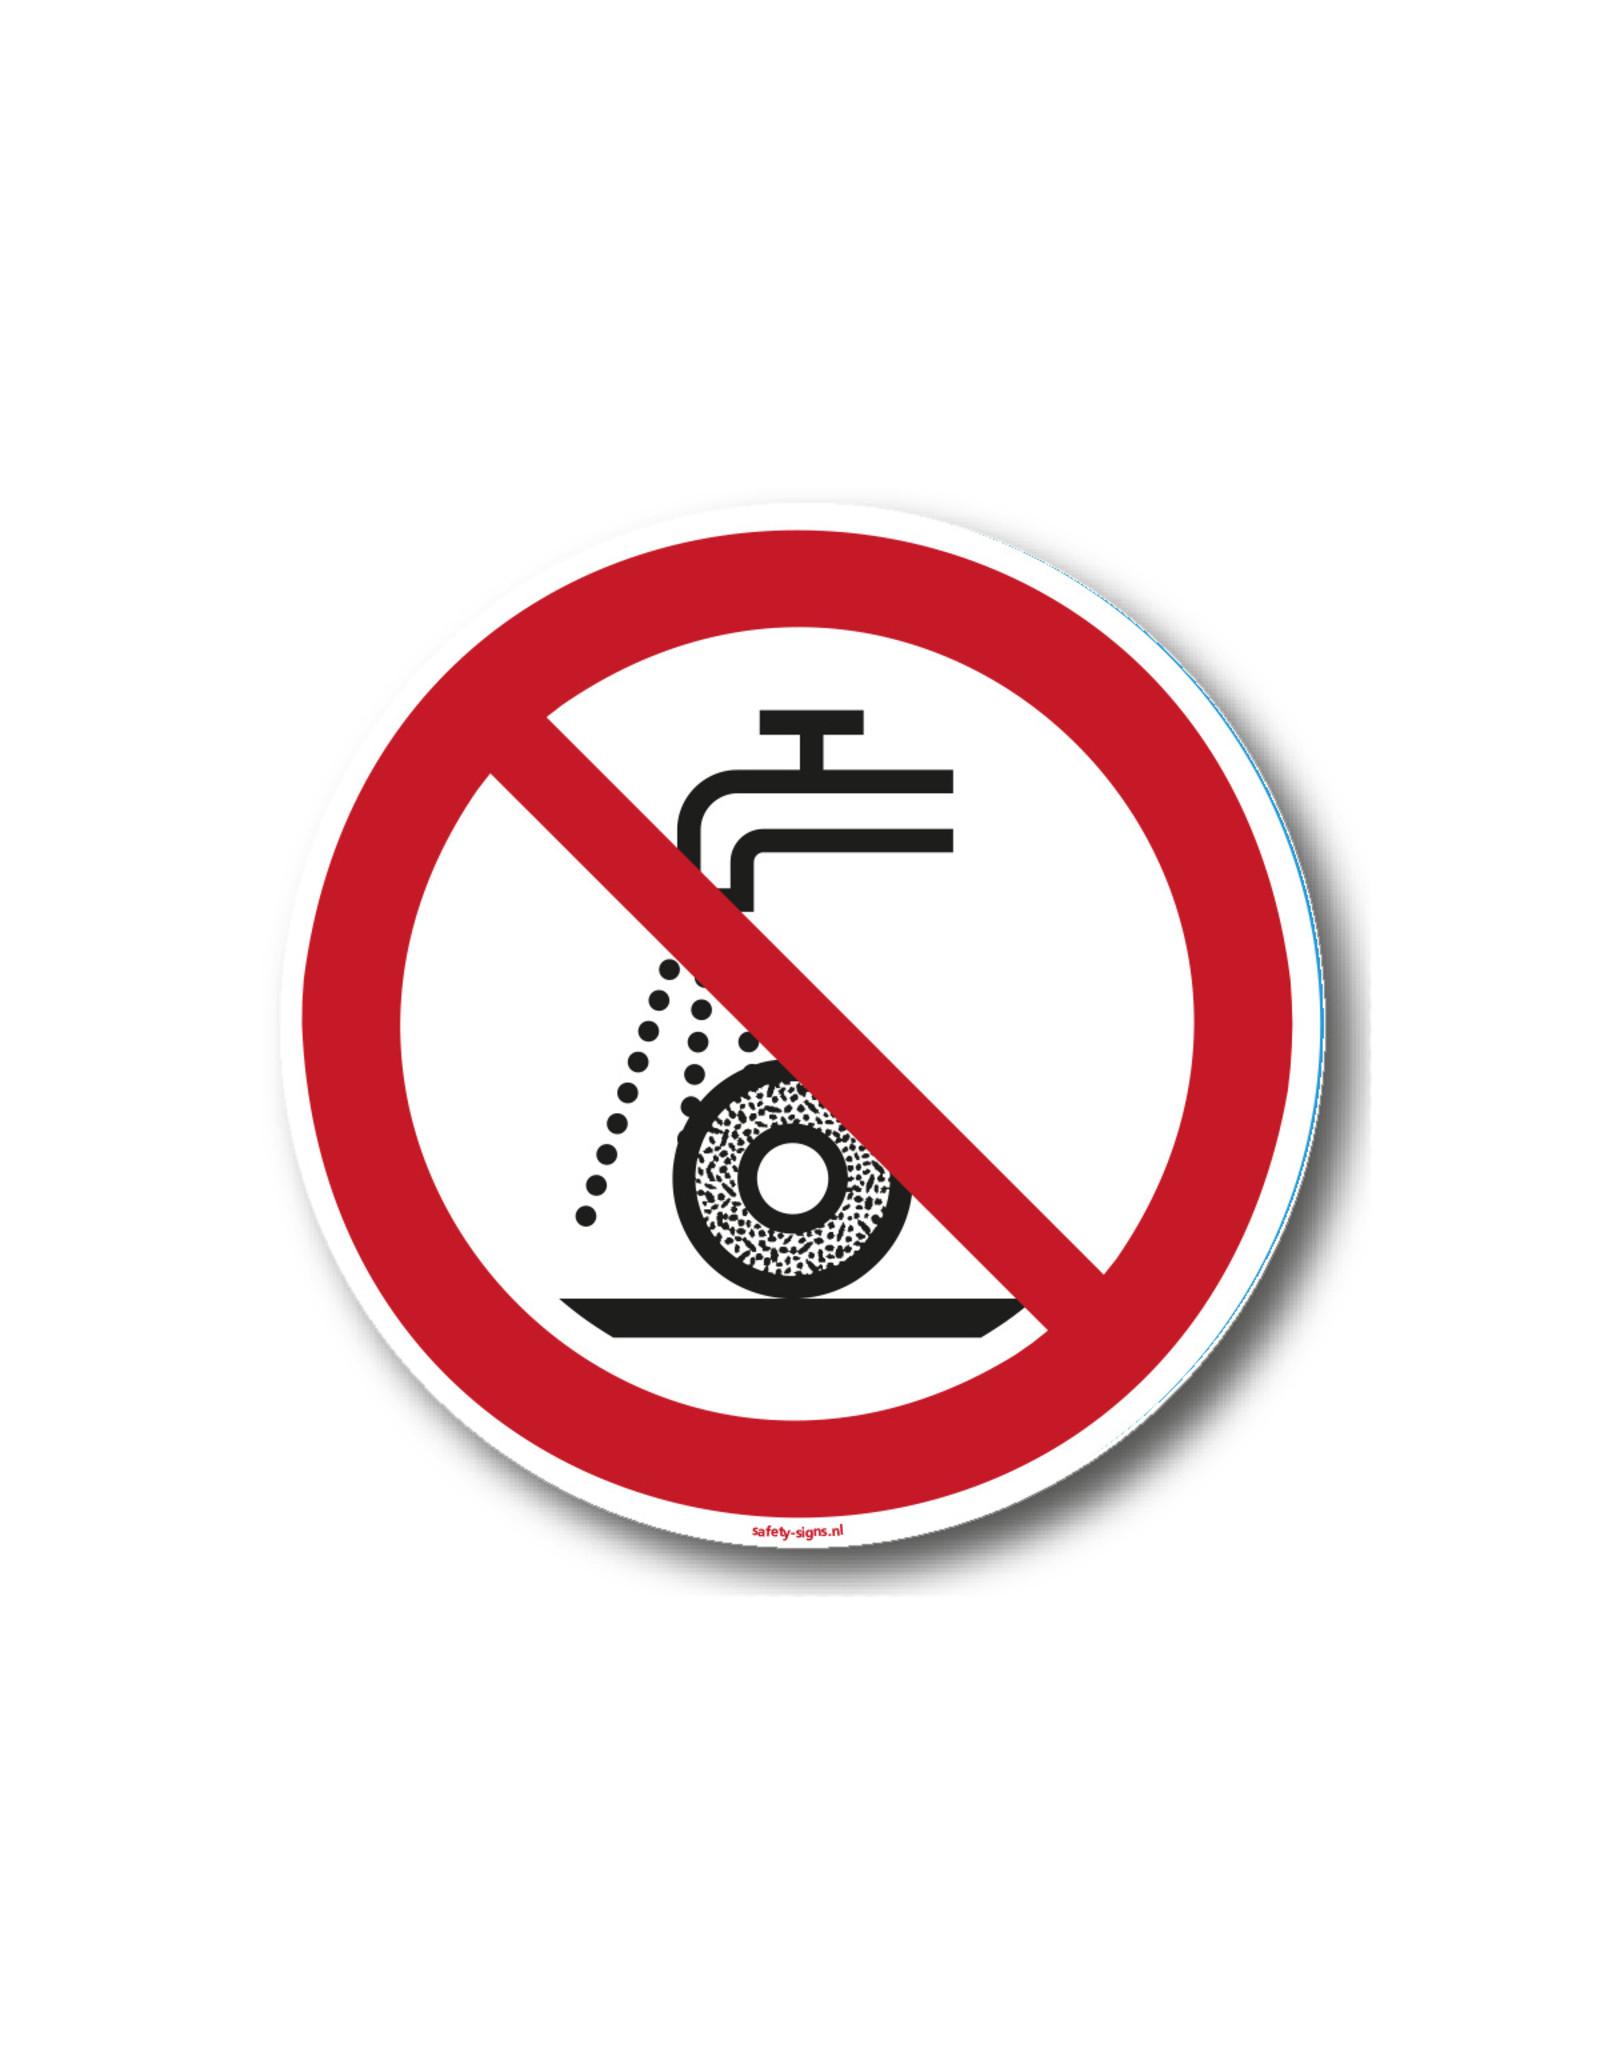 safety-signs.nl Pictogram - P033 - Verboden nat te slijpen - ISO 7010